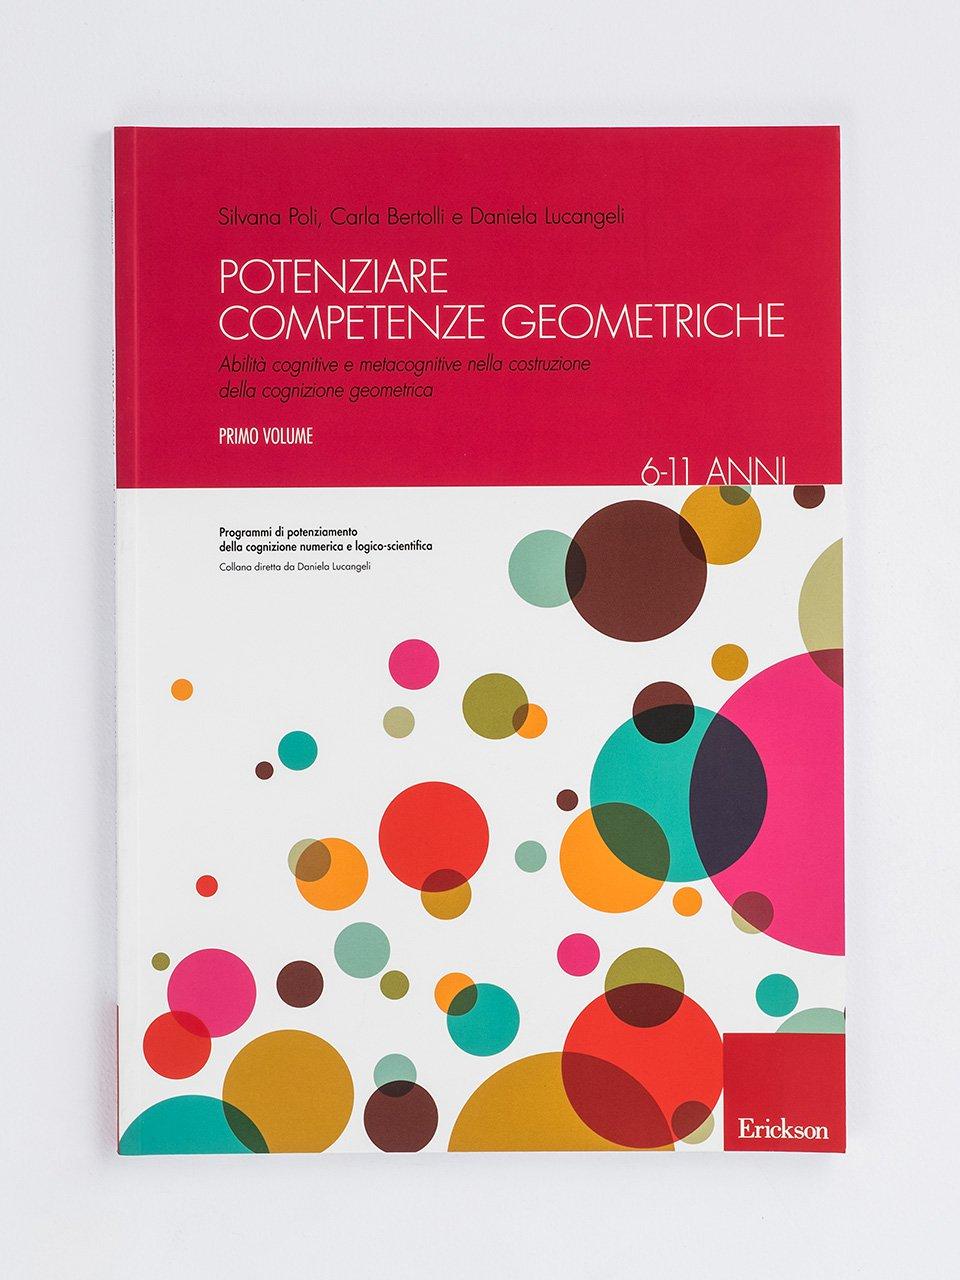 Potenziare competenze geometriche - Volume 1 - Daniela Lucangeli - Erickson